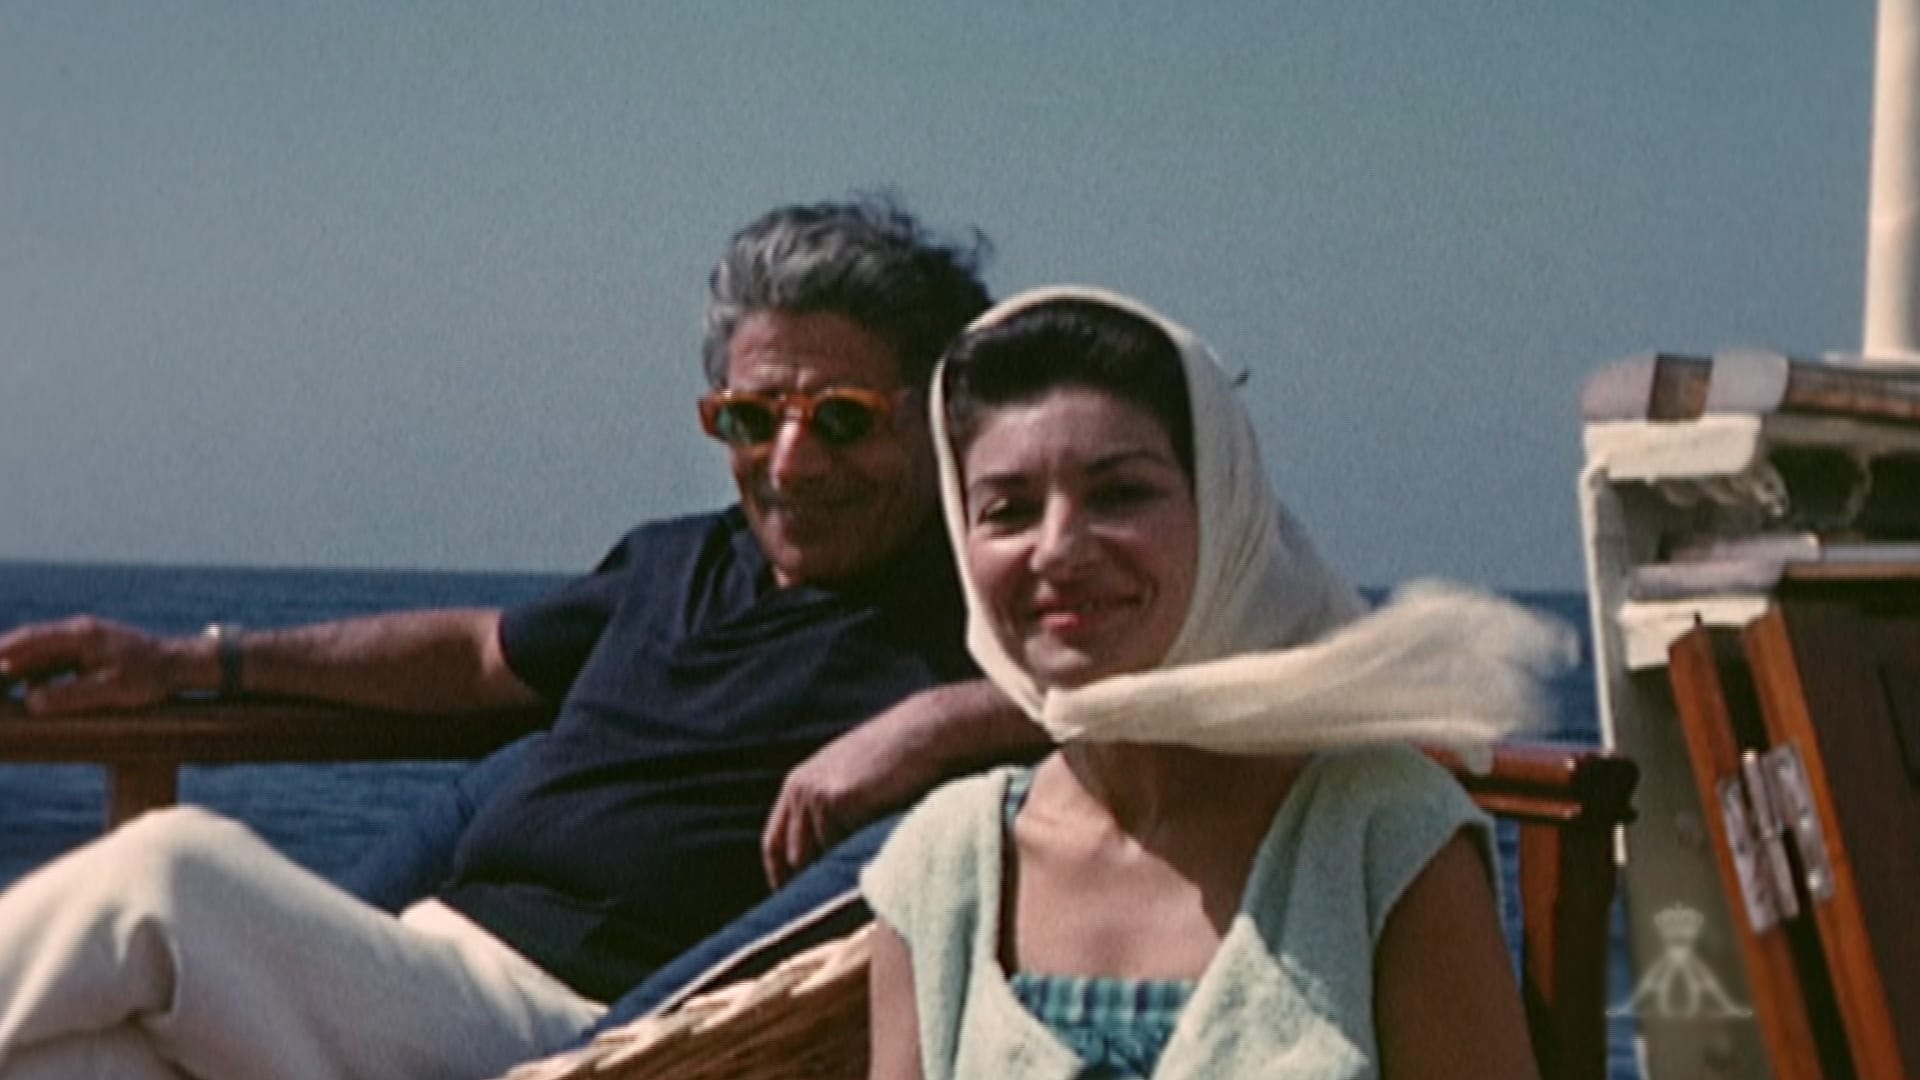 Callas Kennedy Onassis 2 reines pour un roi de Philippe Kohly image documentaire